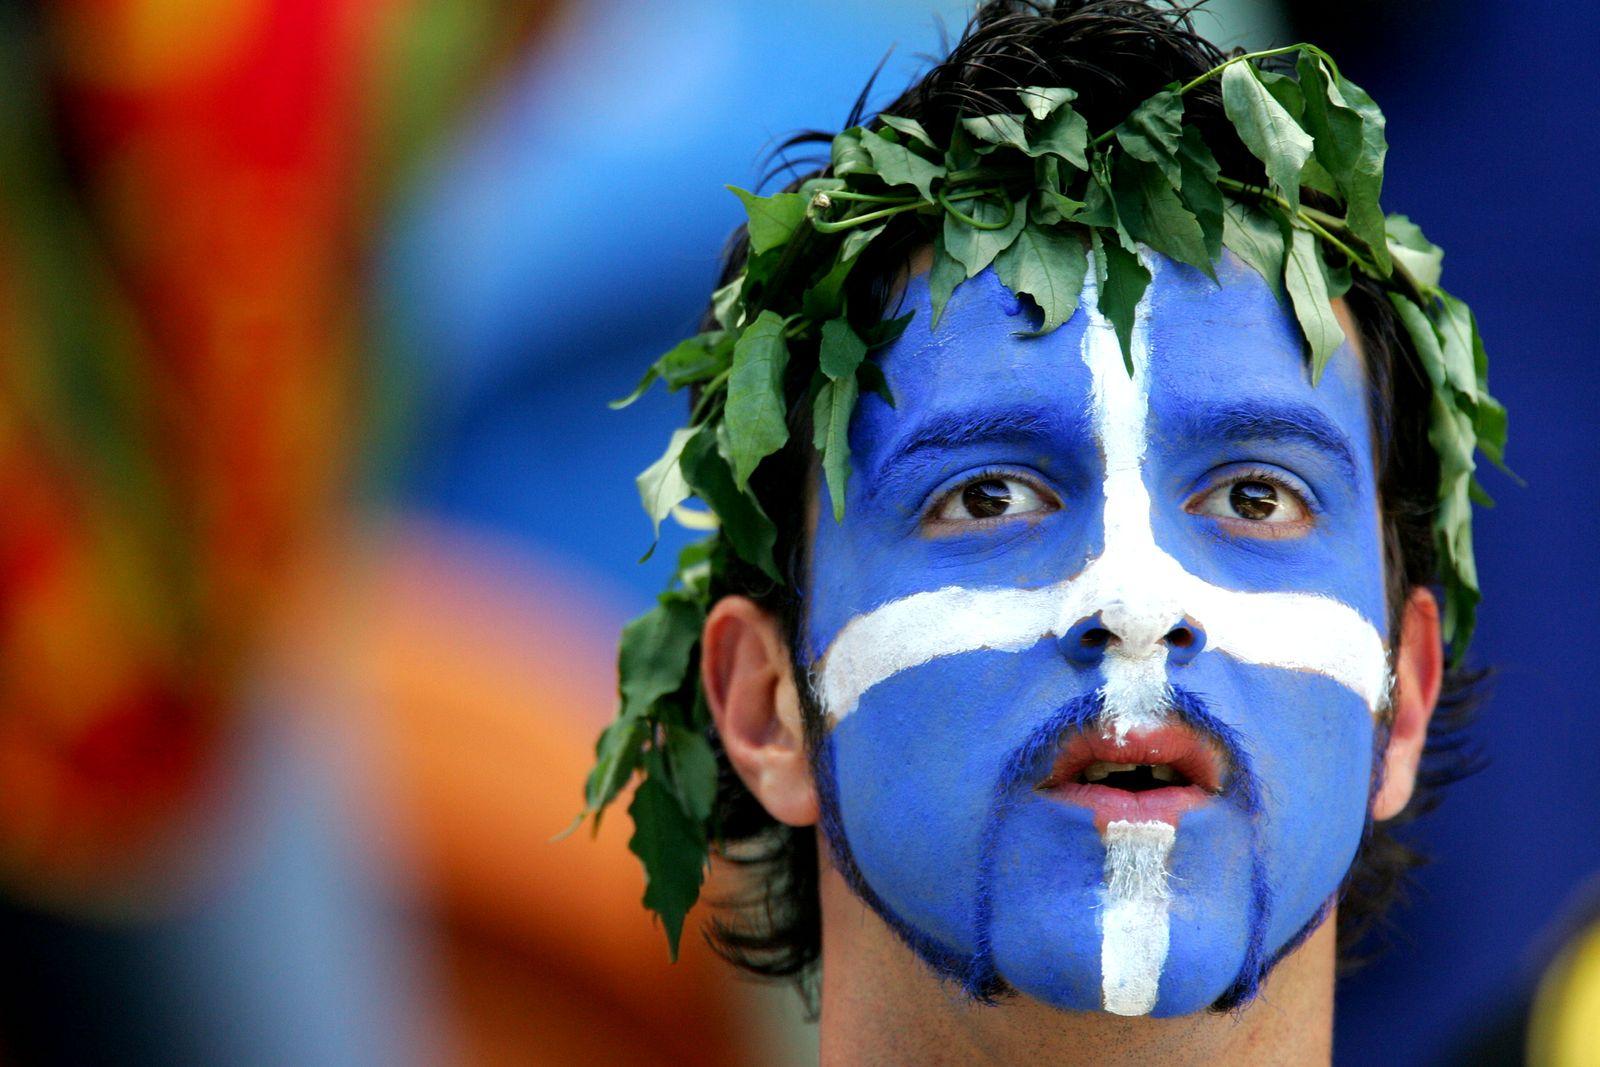 Griechischer Fussballfan